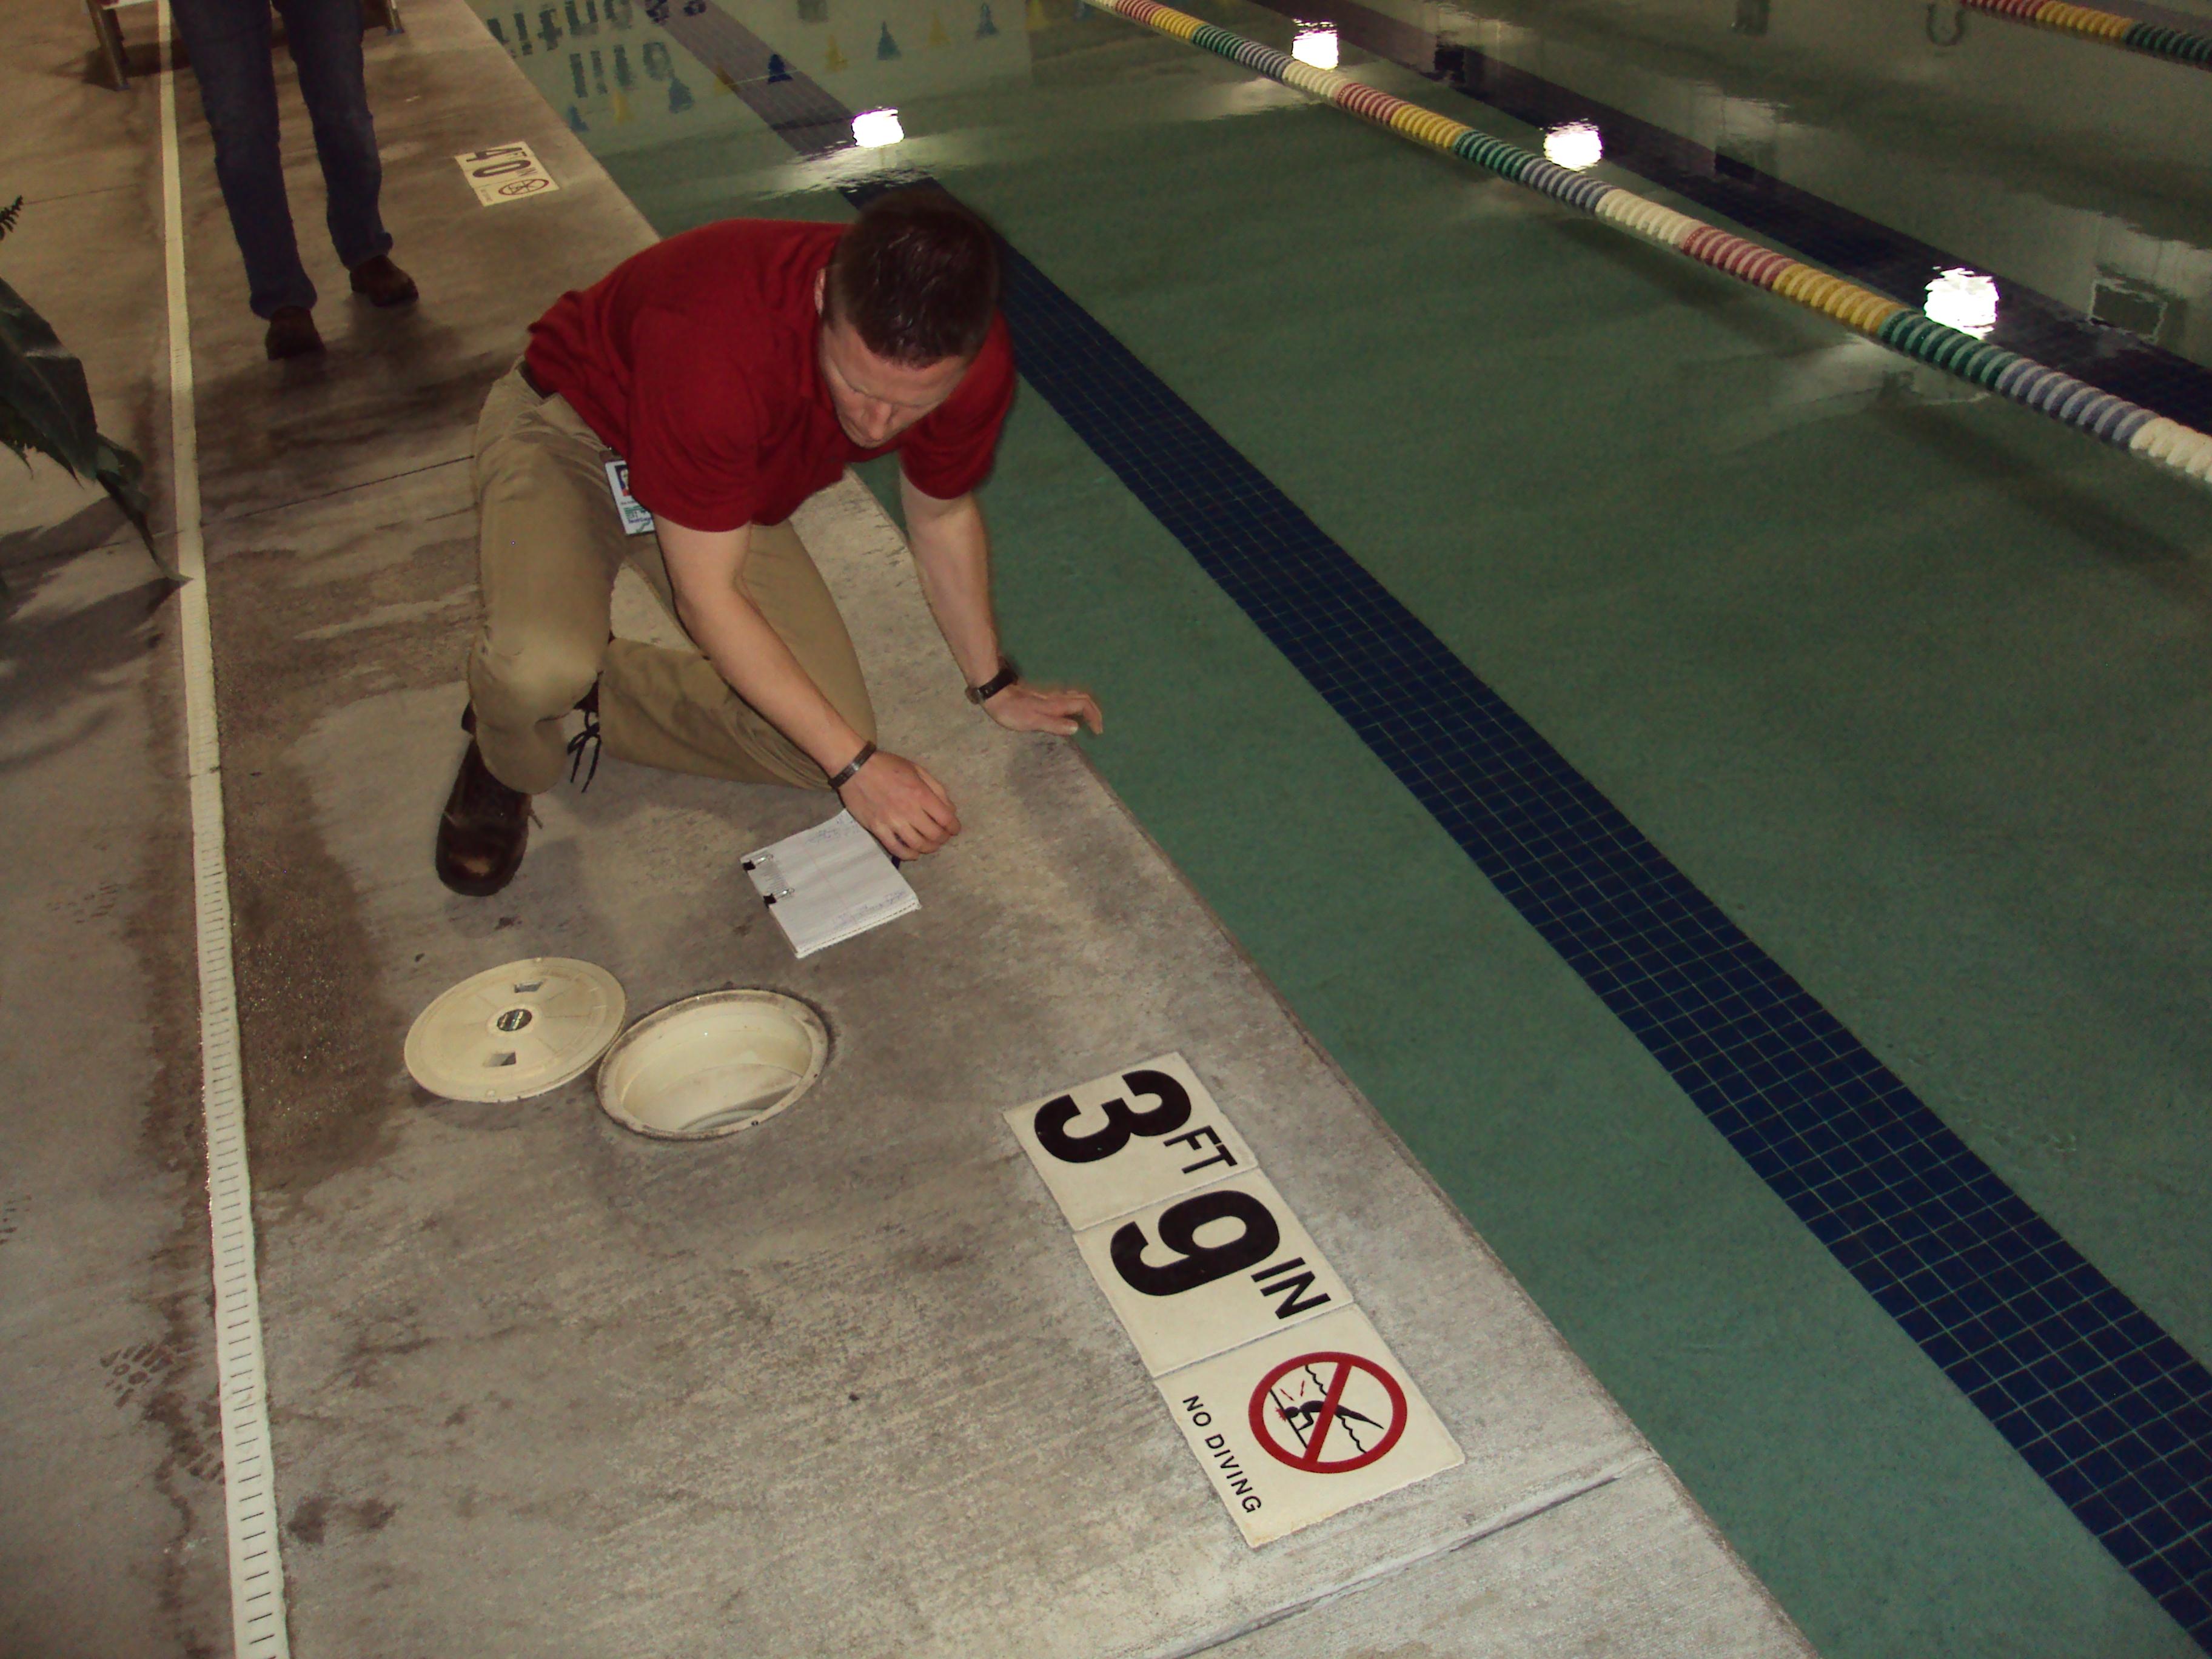 Public Swimming Pool public swimming pools & spas   scott county, iowa